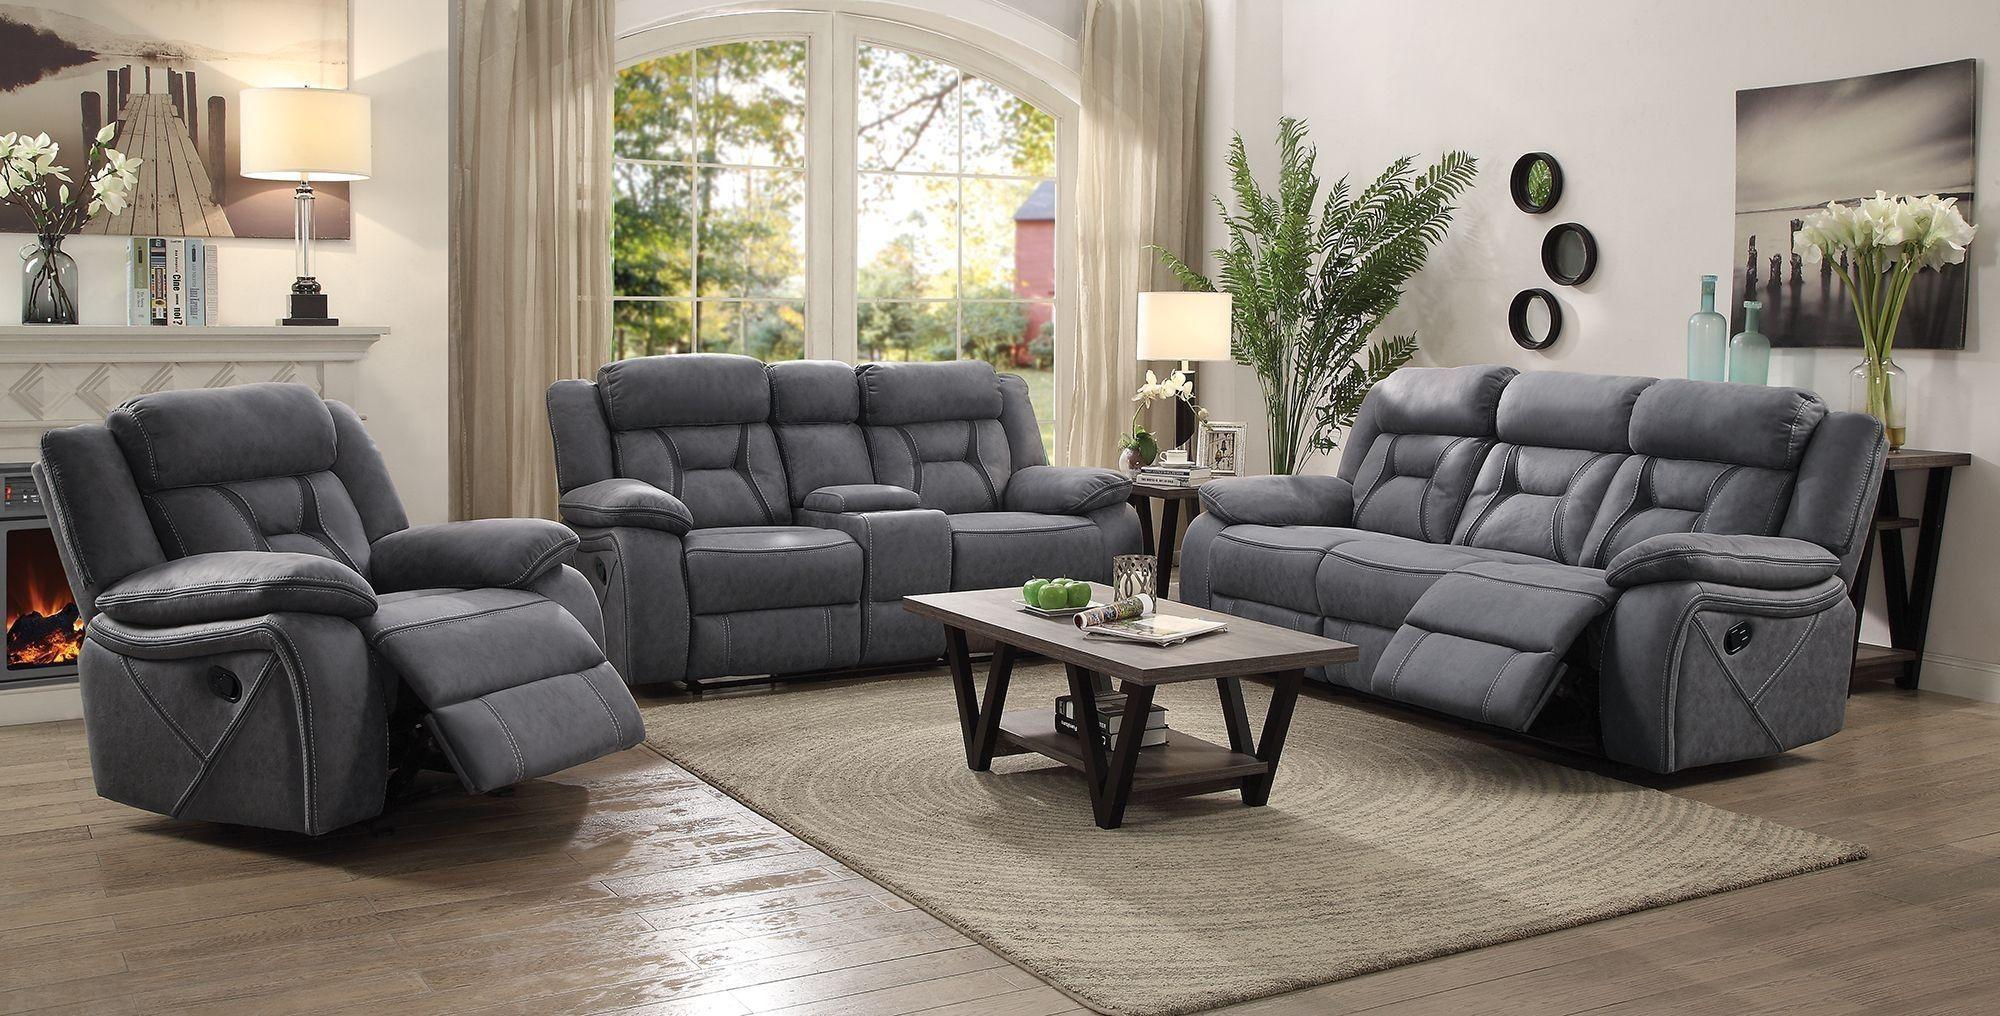 Higgins Gray Reclining Living Room Set In 2020 Sofa And Loveseat Set Reclining Sofa Living Room Sets #suede #living #room #sets